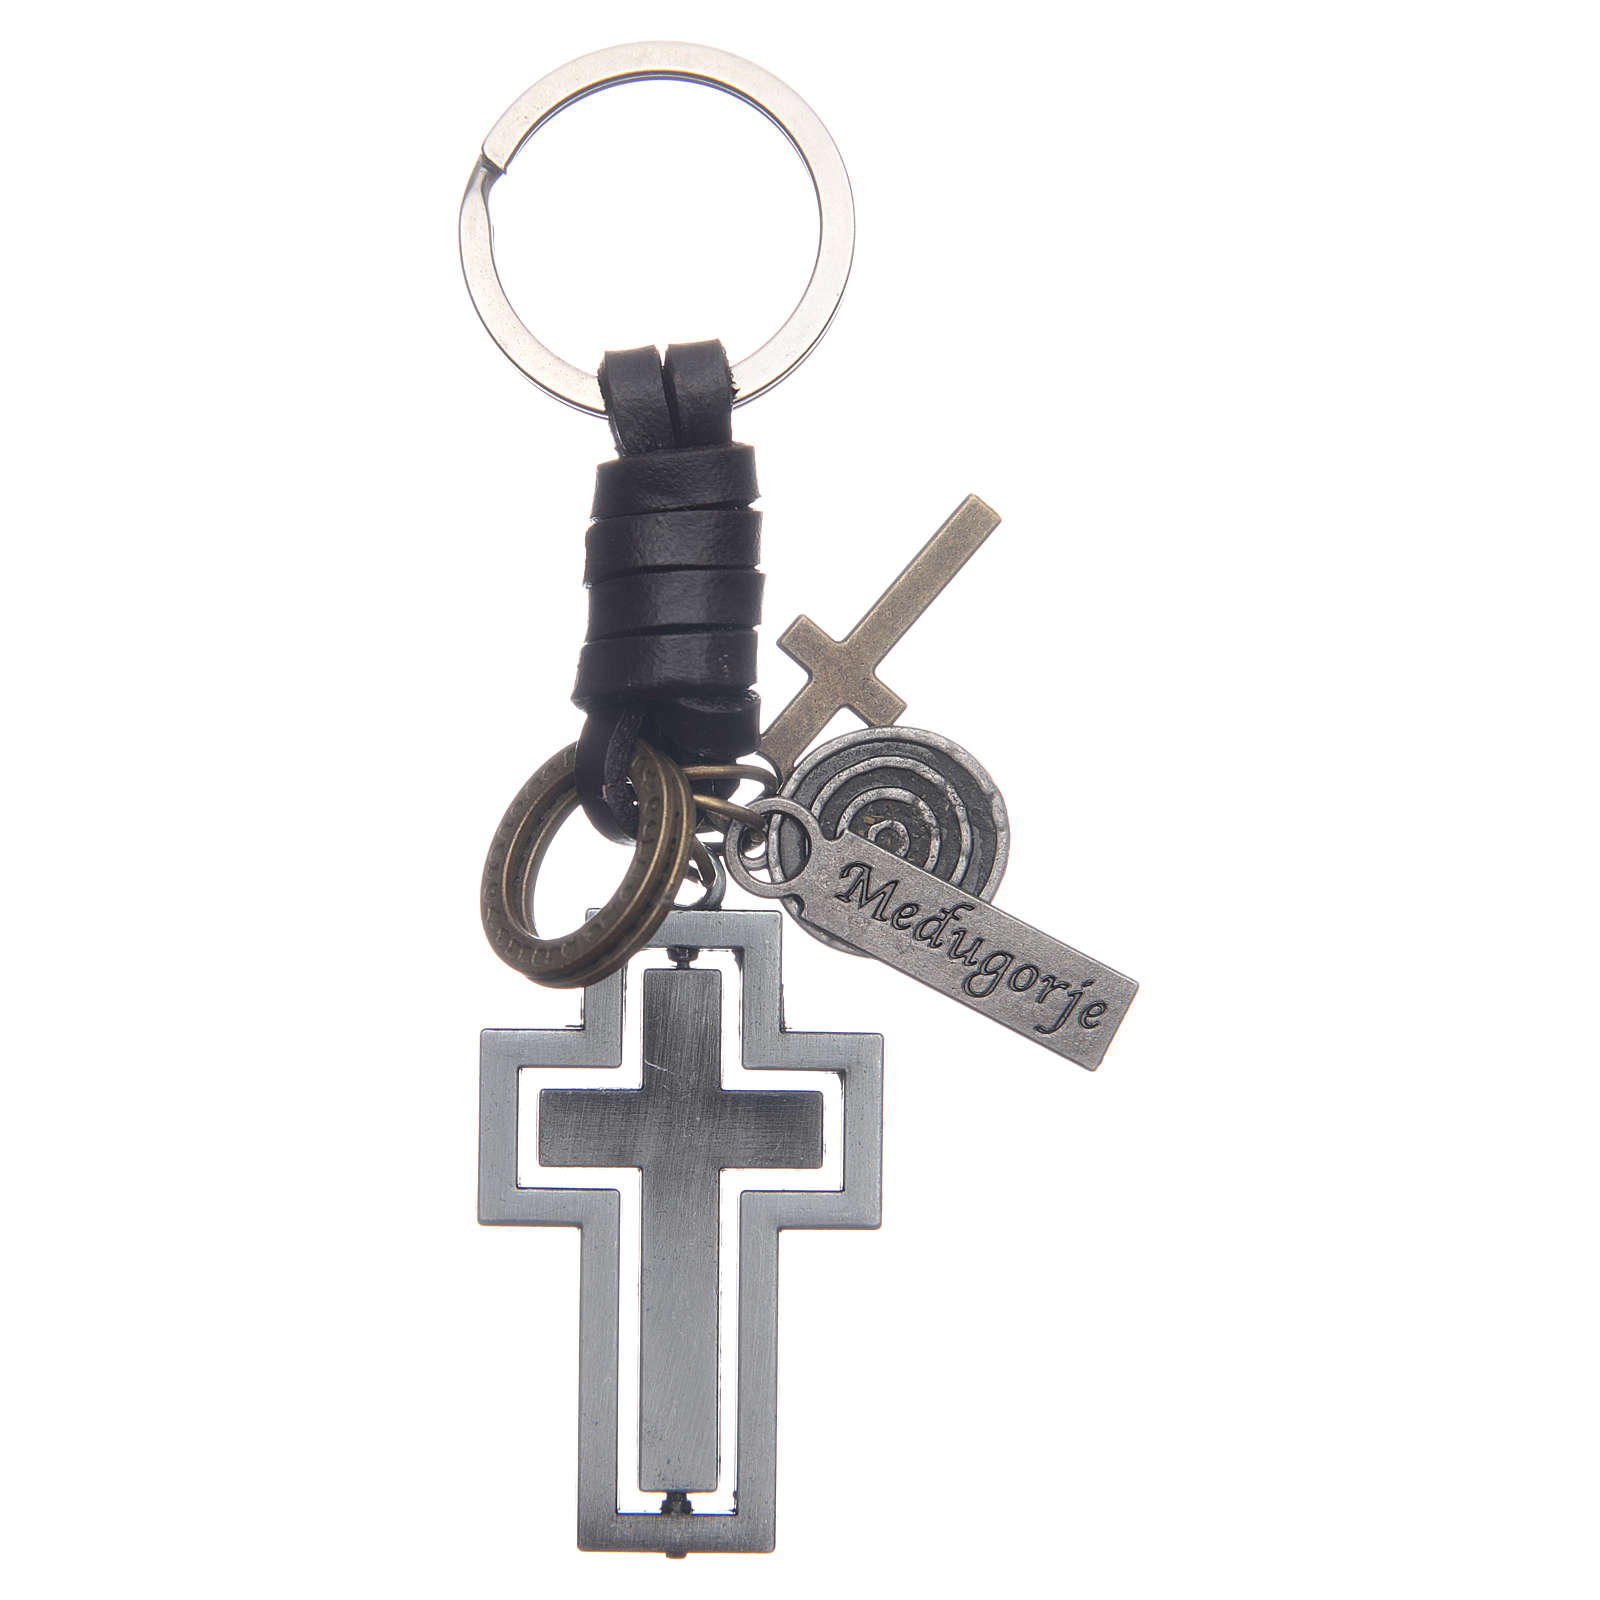 Medjugorje metal key ring 4